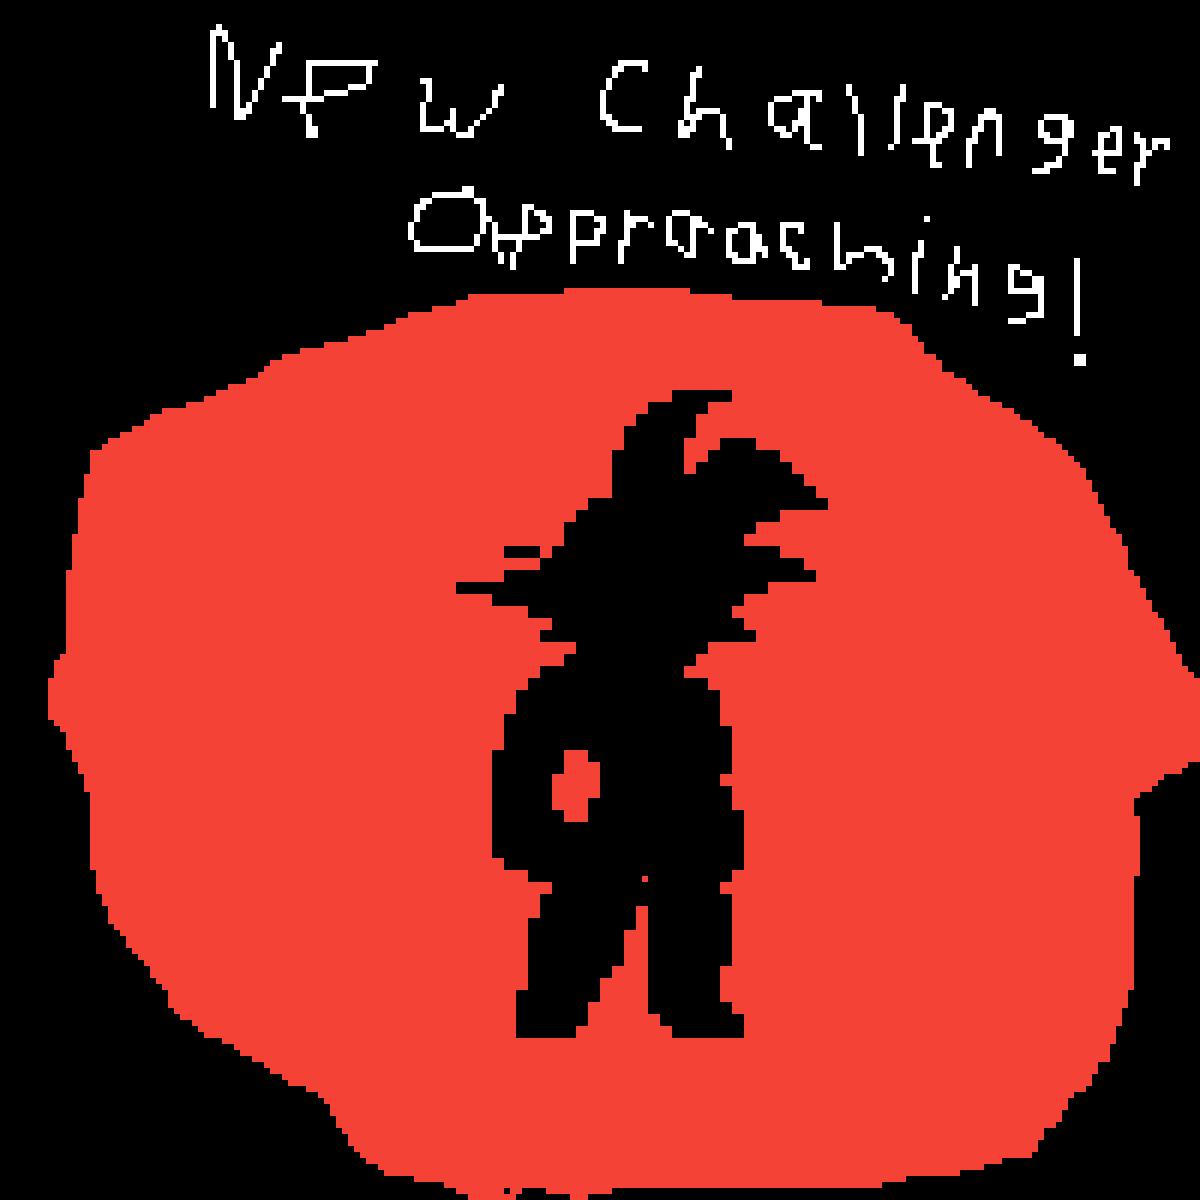 2nd challenger approaching by PixelatorMan